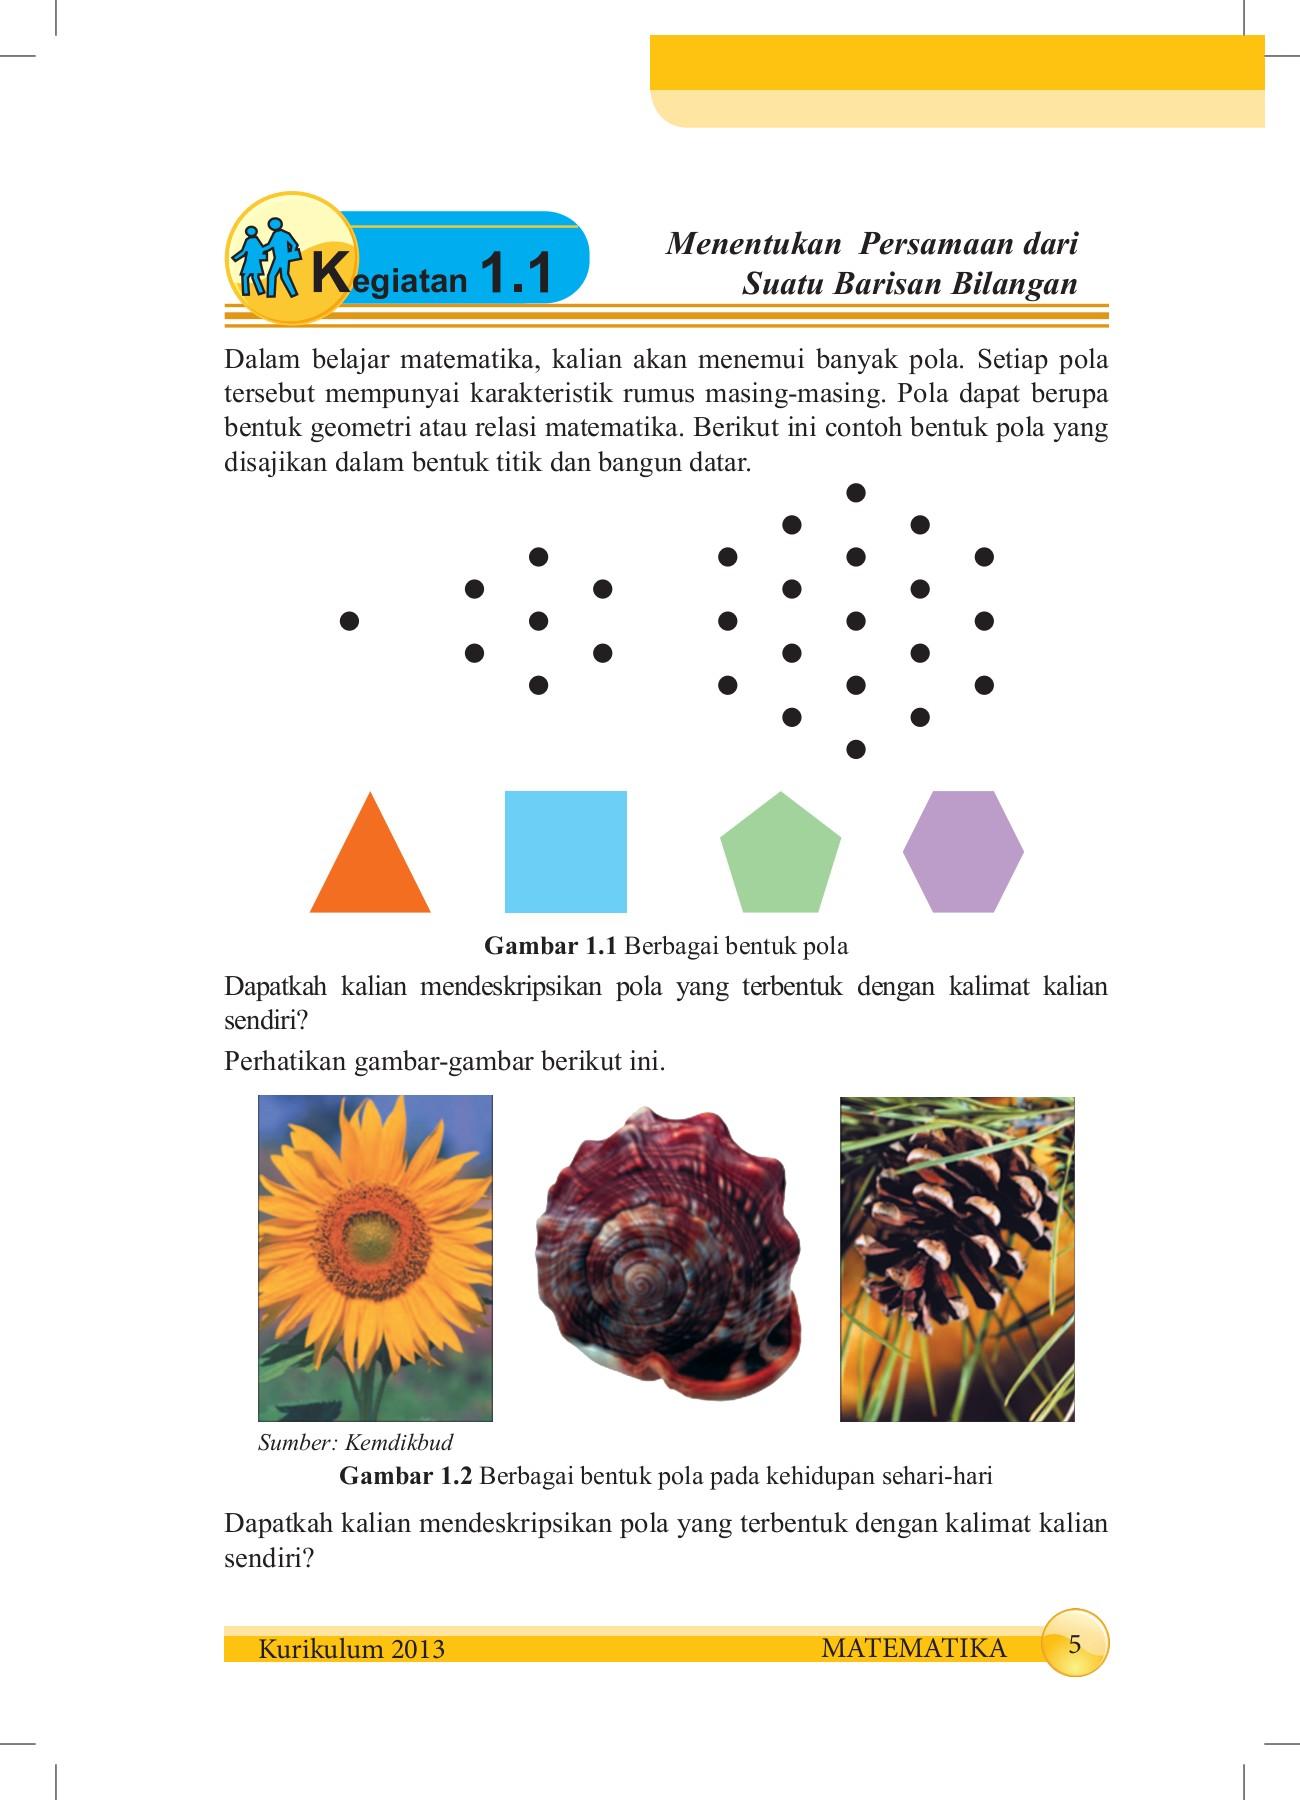 Pola Bilangan Dalam Kehidupan Sehari Hari : bilangan, dalam, kehidupan, sehari, Bilangan, Pages, PubHTML5